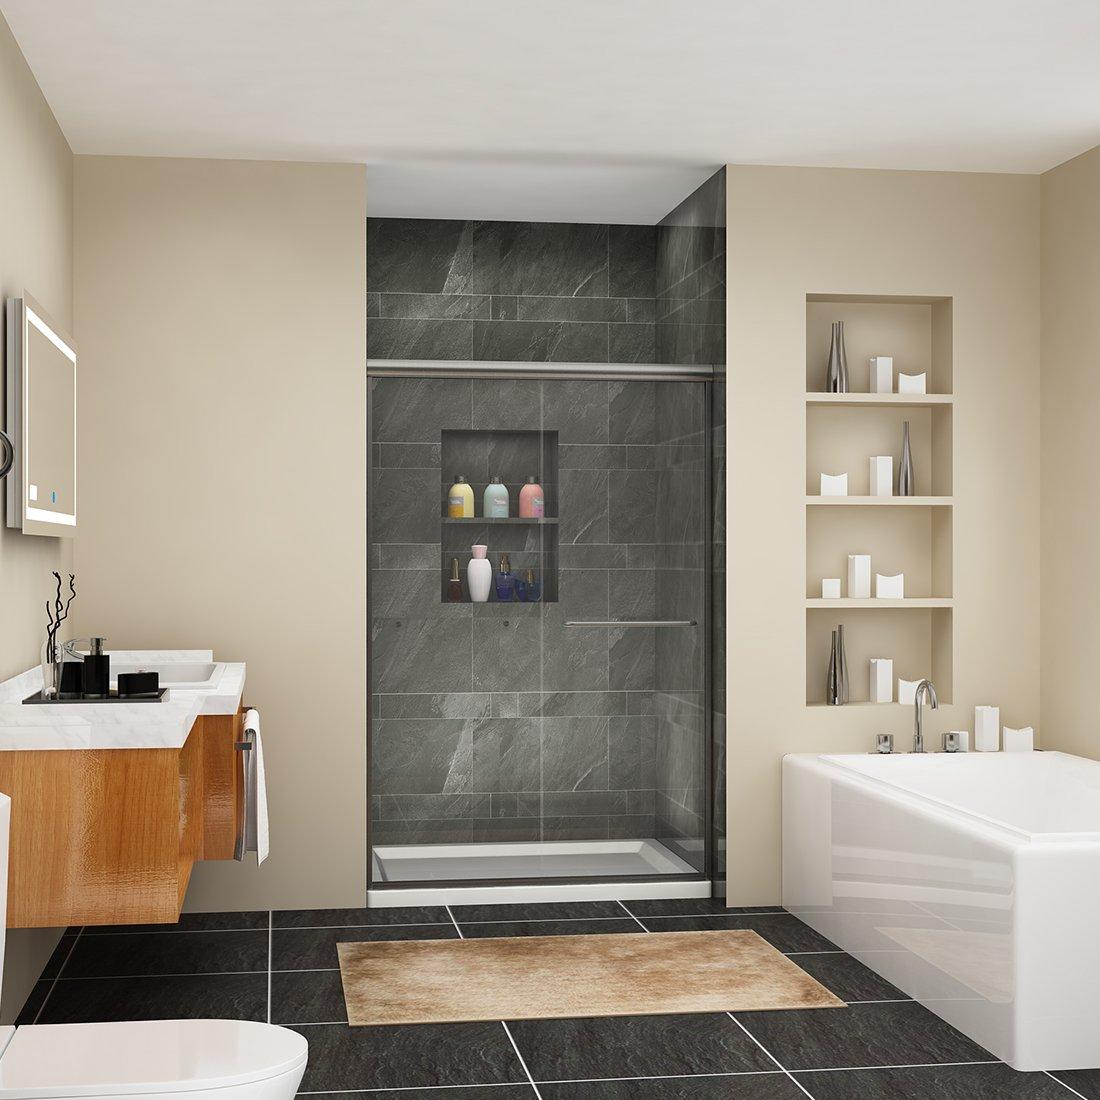 SUNNY SHOWER Semi-frameless Glass Sliding Shower Doors 1 4 Clear Glass Shower Screen Panel 48 W x 72 H, Brushed Nickel